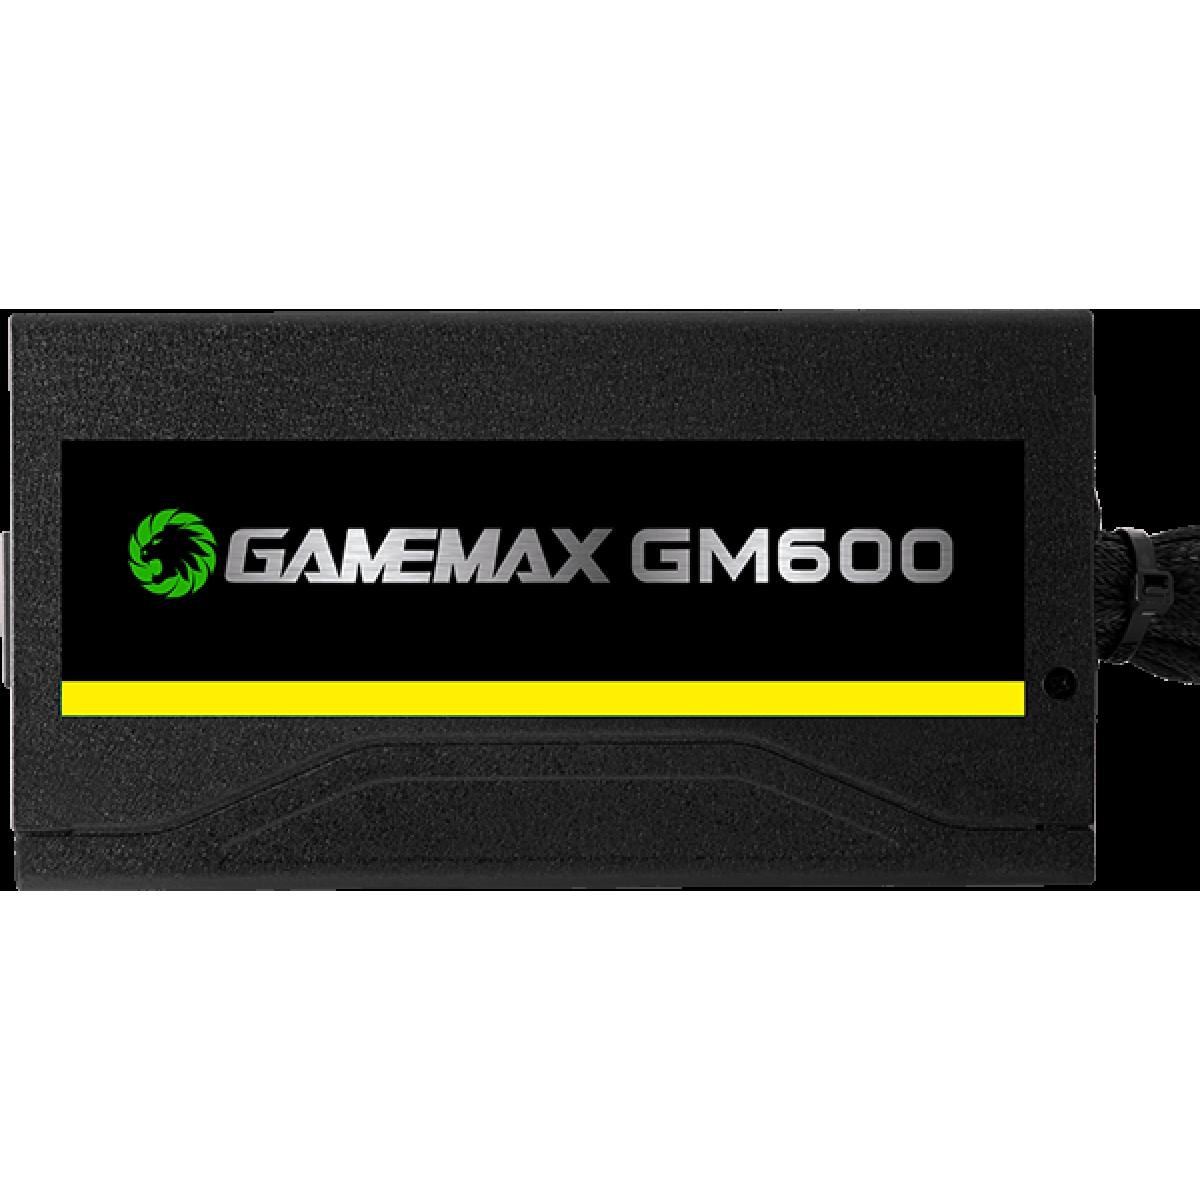 Fonte Gamemax GM600 600W, 80 Plus Bronze, PFC Ativo, Semi Modular, OEM